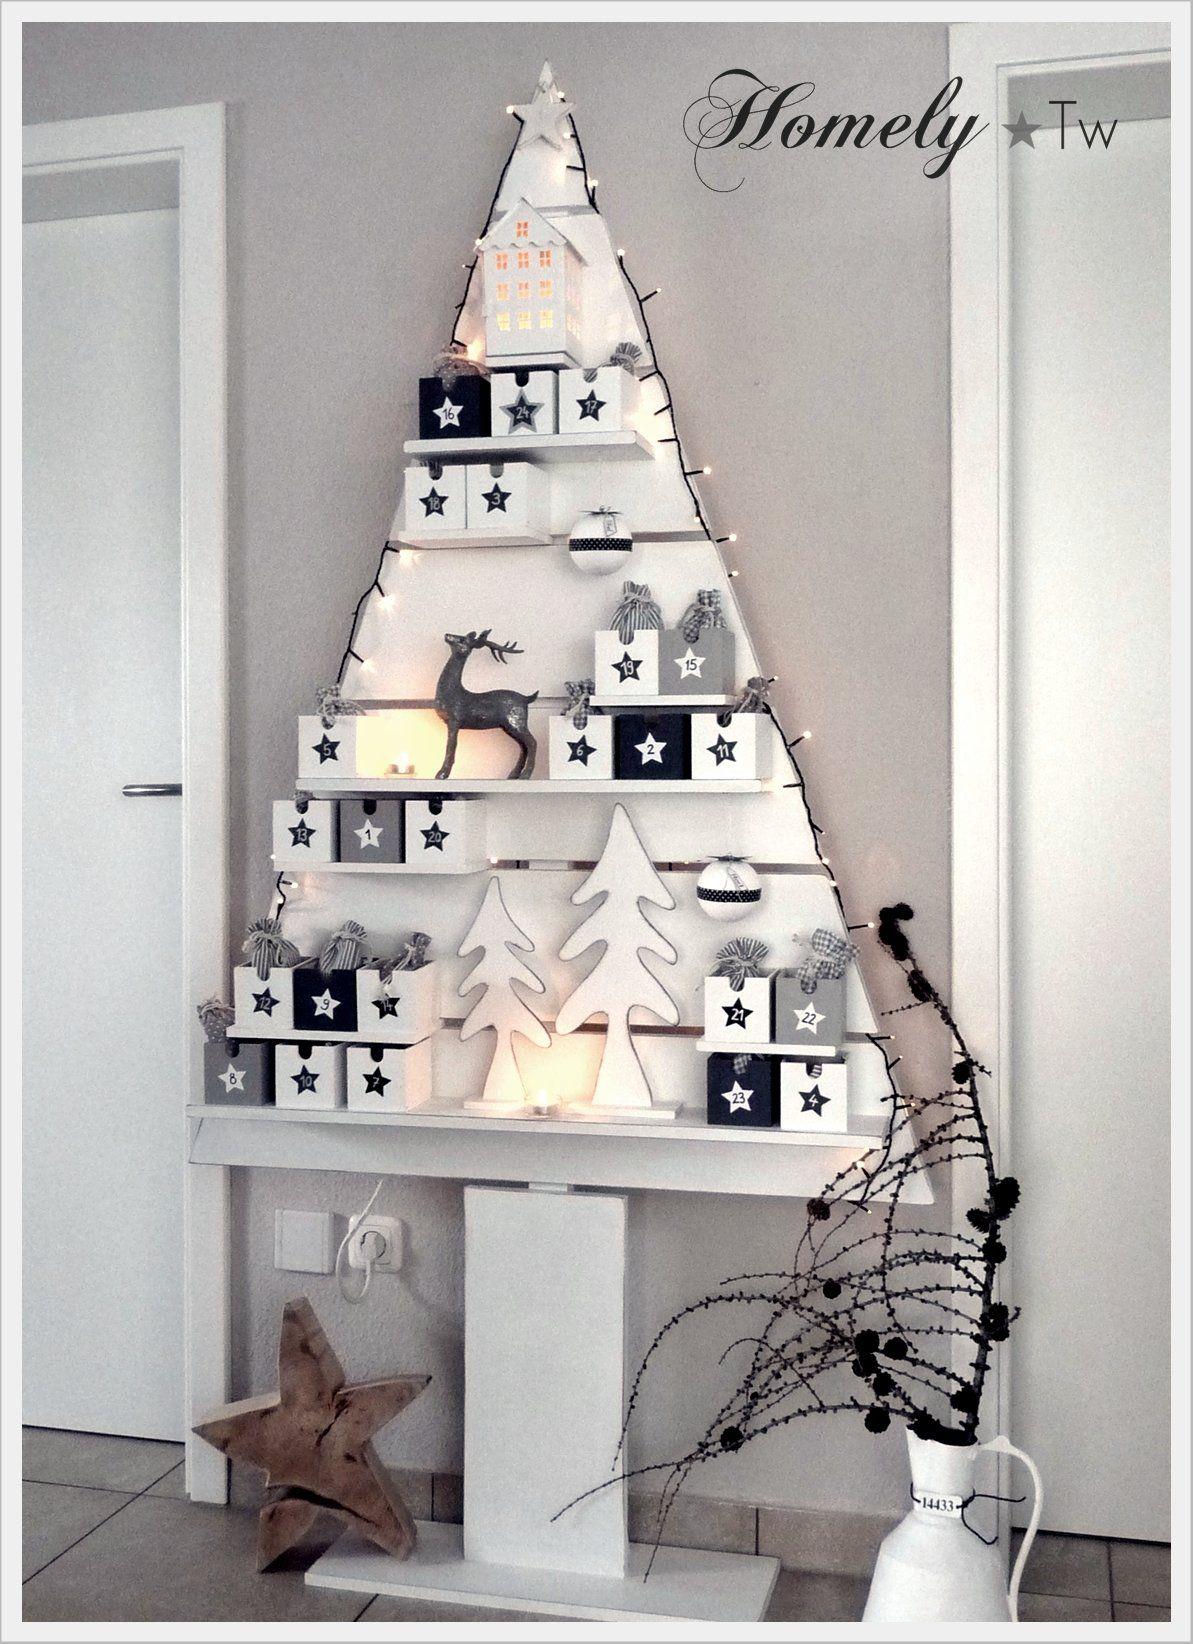 selbstgebauter holz weihnachtsbaum war der adventskalender f r die kinder christmas. Black Bedroom Furniture Sets. Home Design Ideas